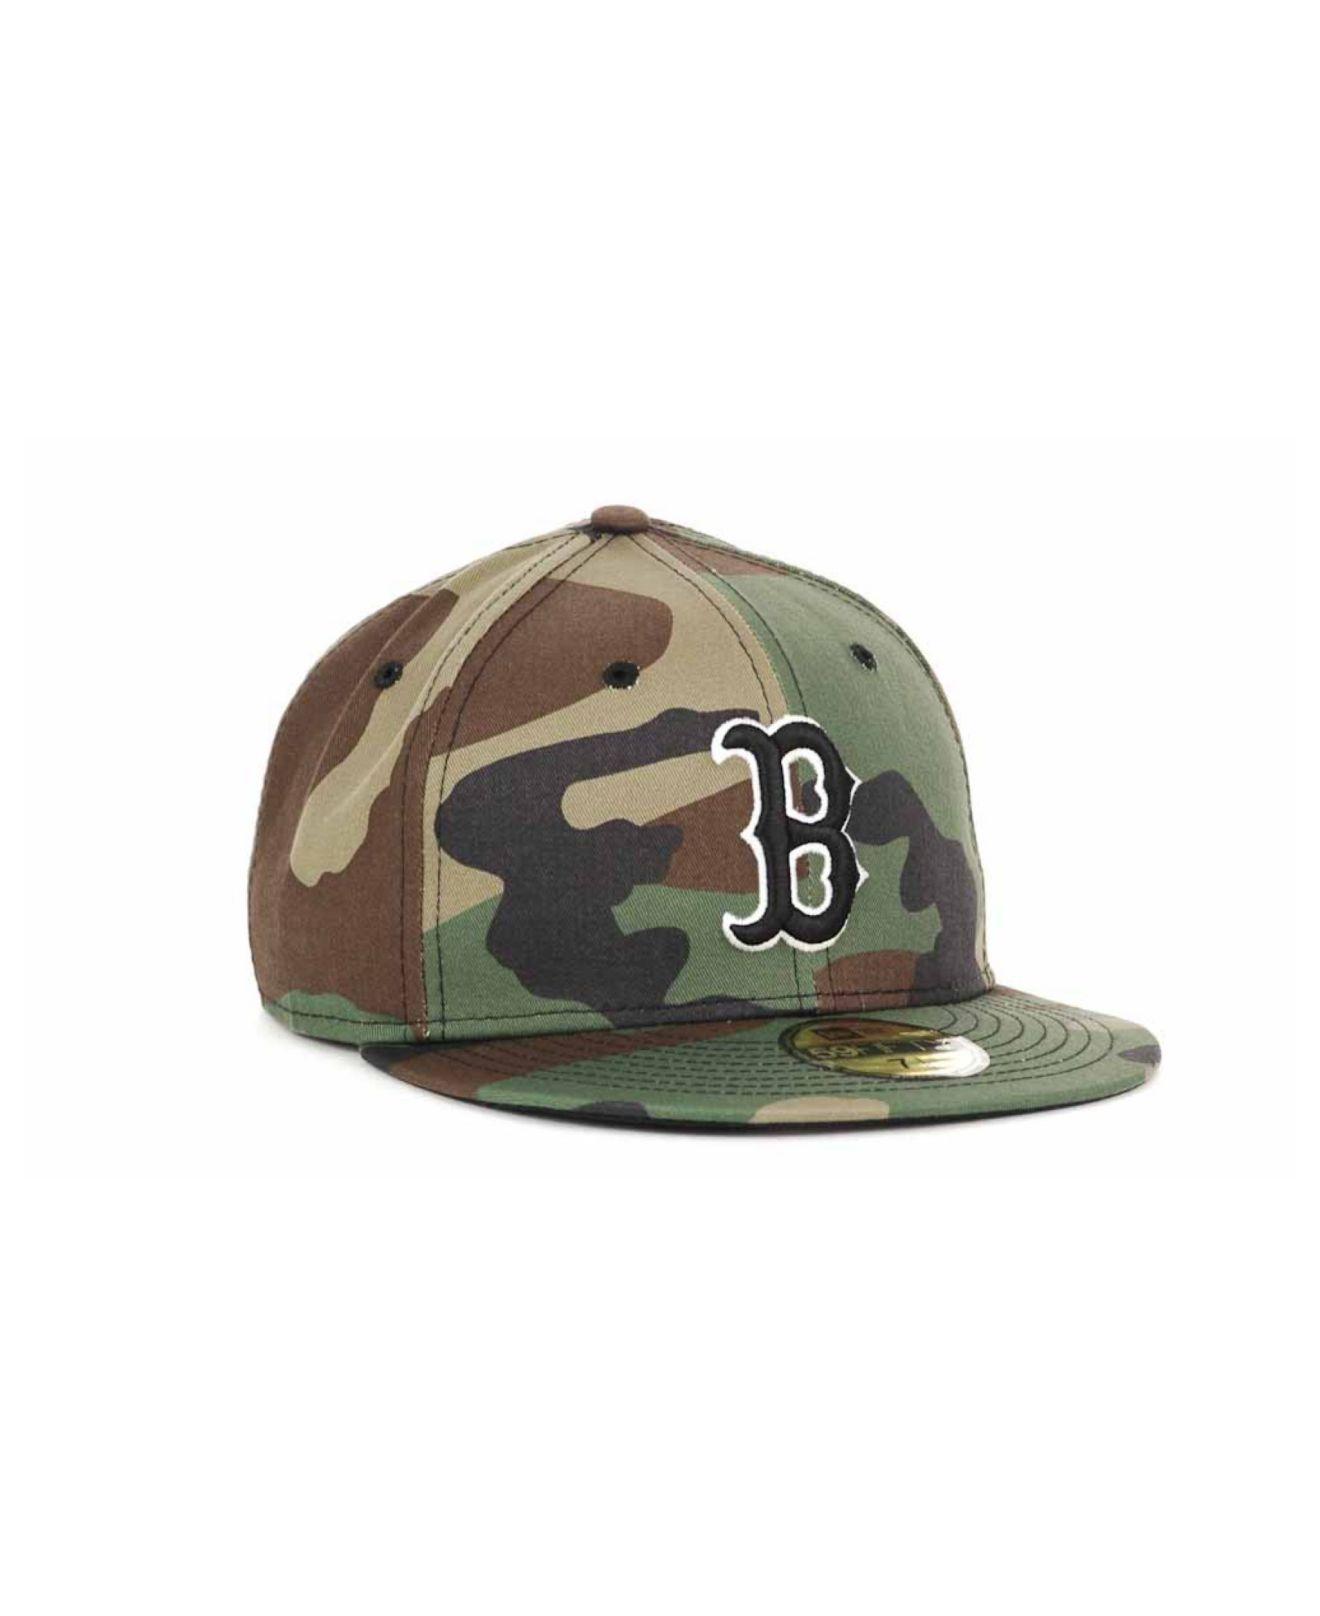 Lyst - KTZ Boston Red Sox Bc Camo 59fifty Cap in Green for Men d895419c7d5